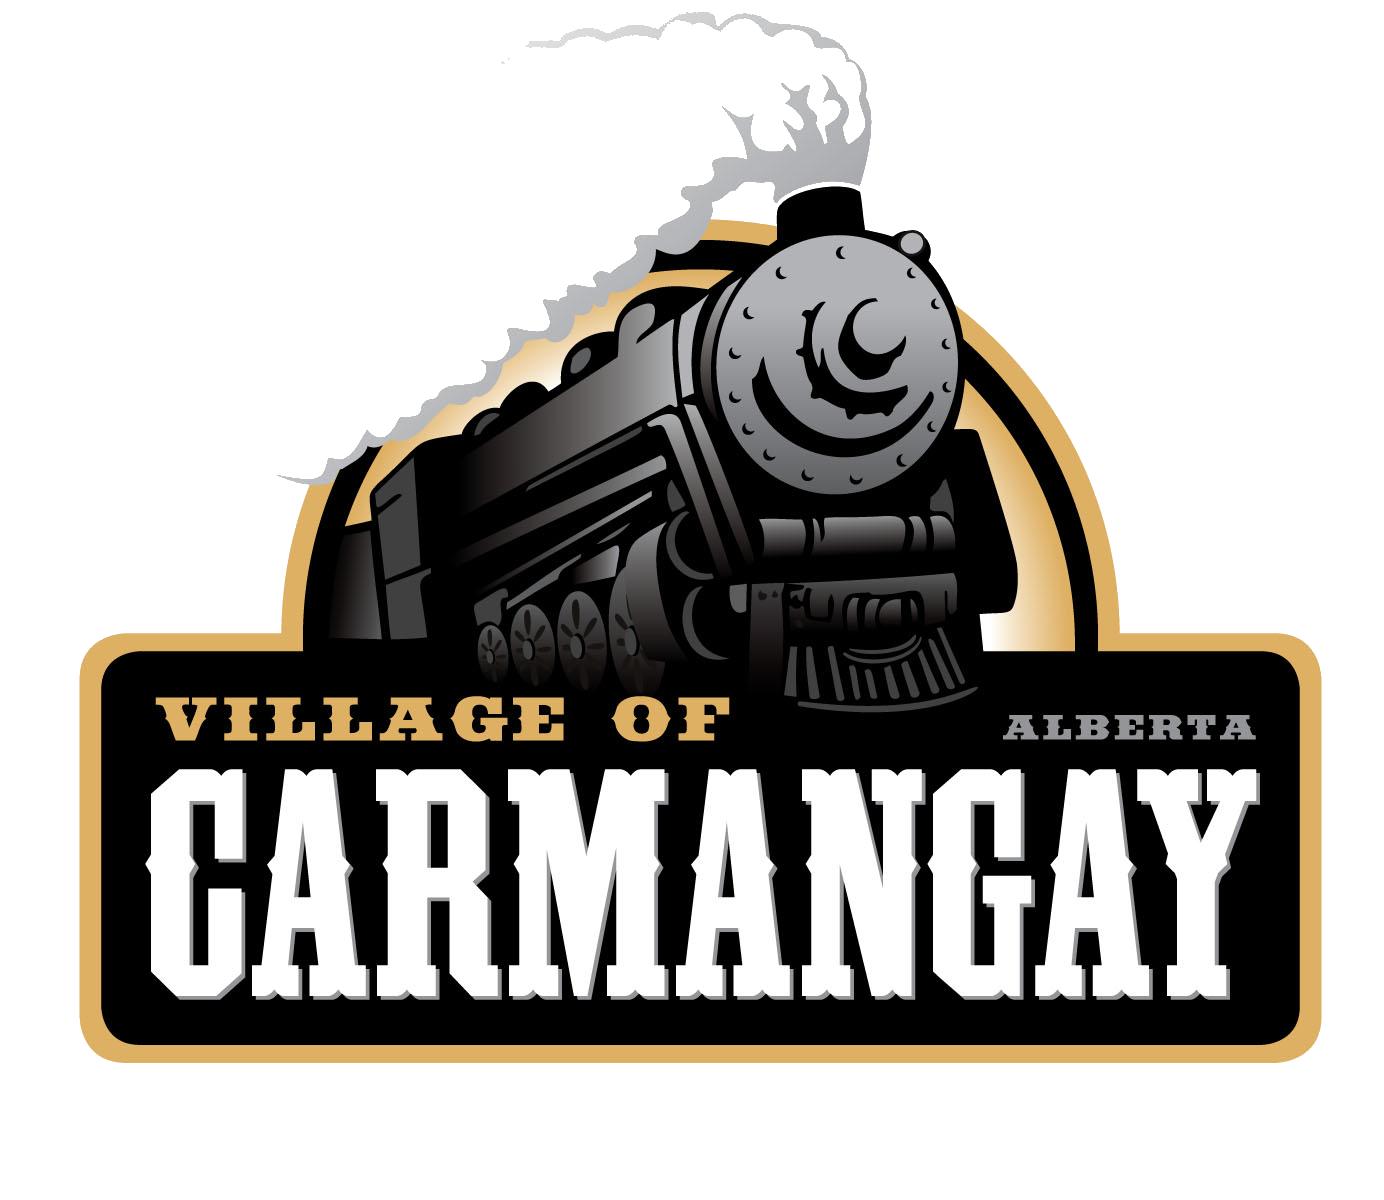 Village of Carmangay